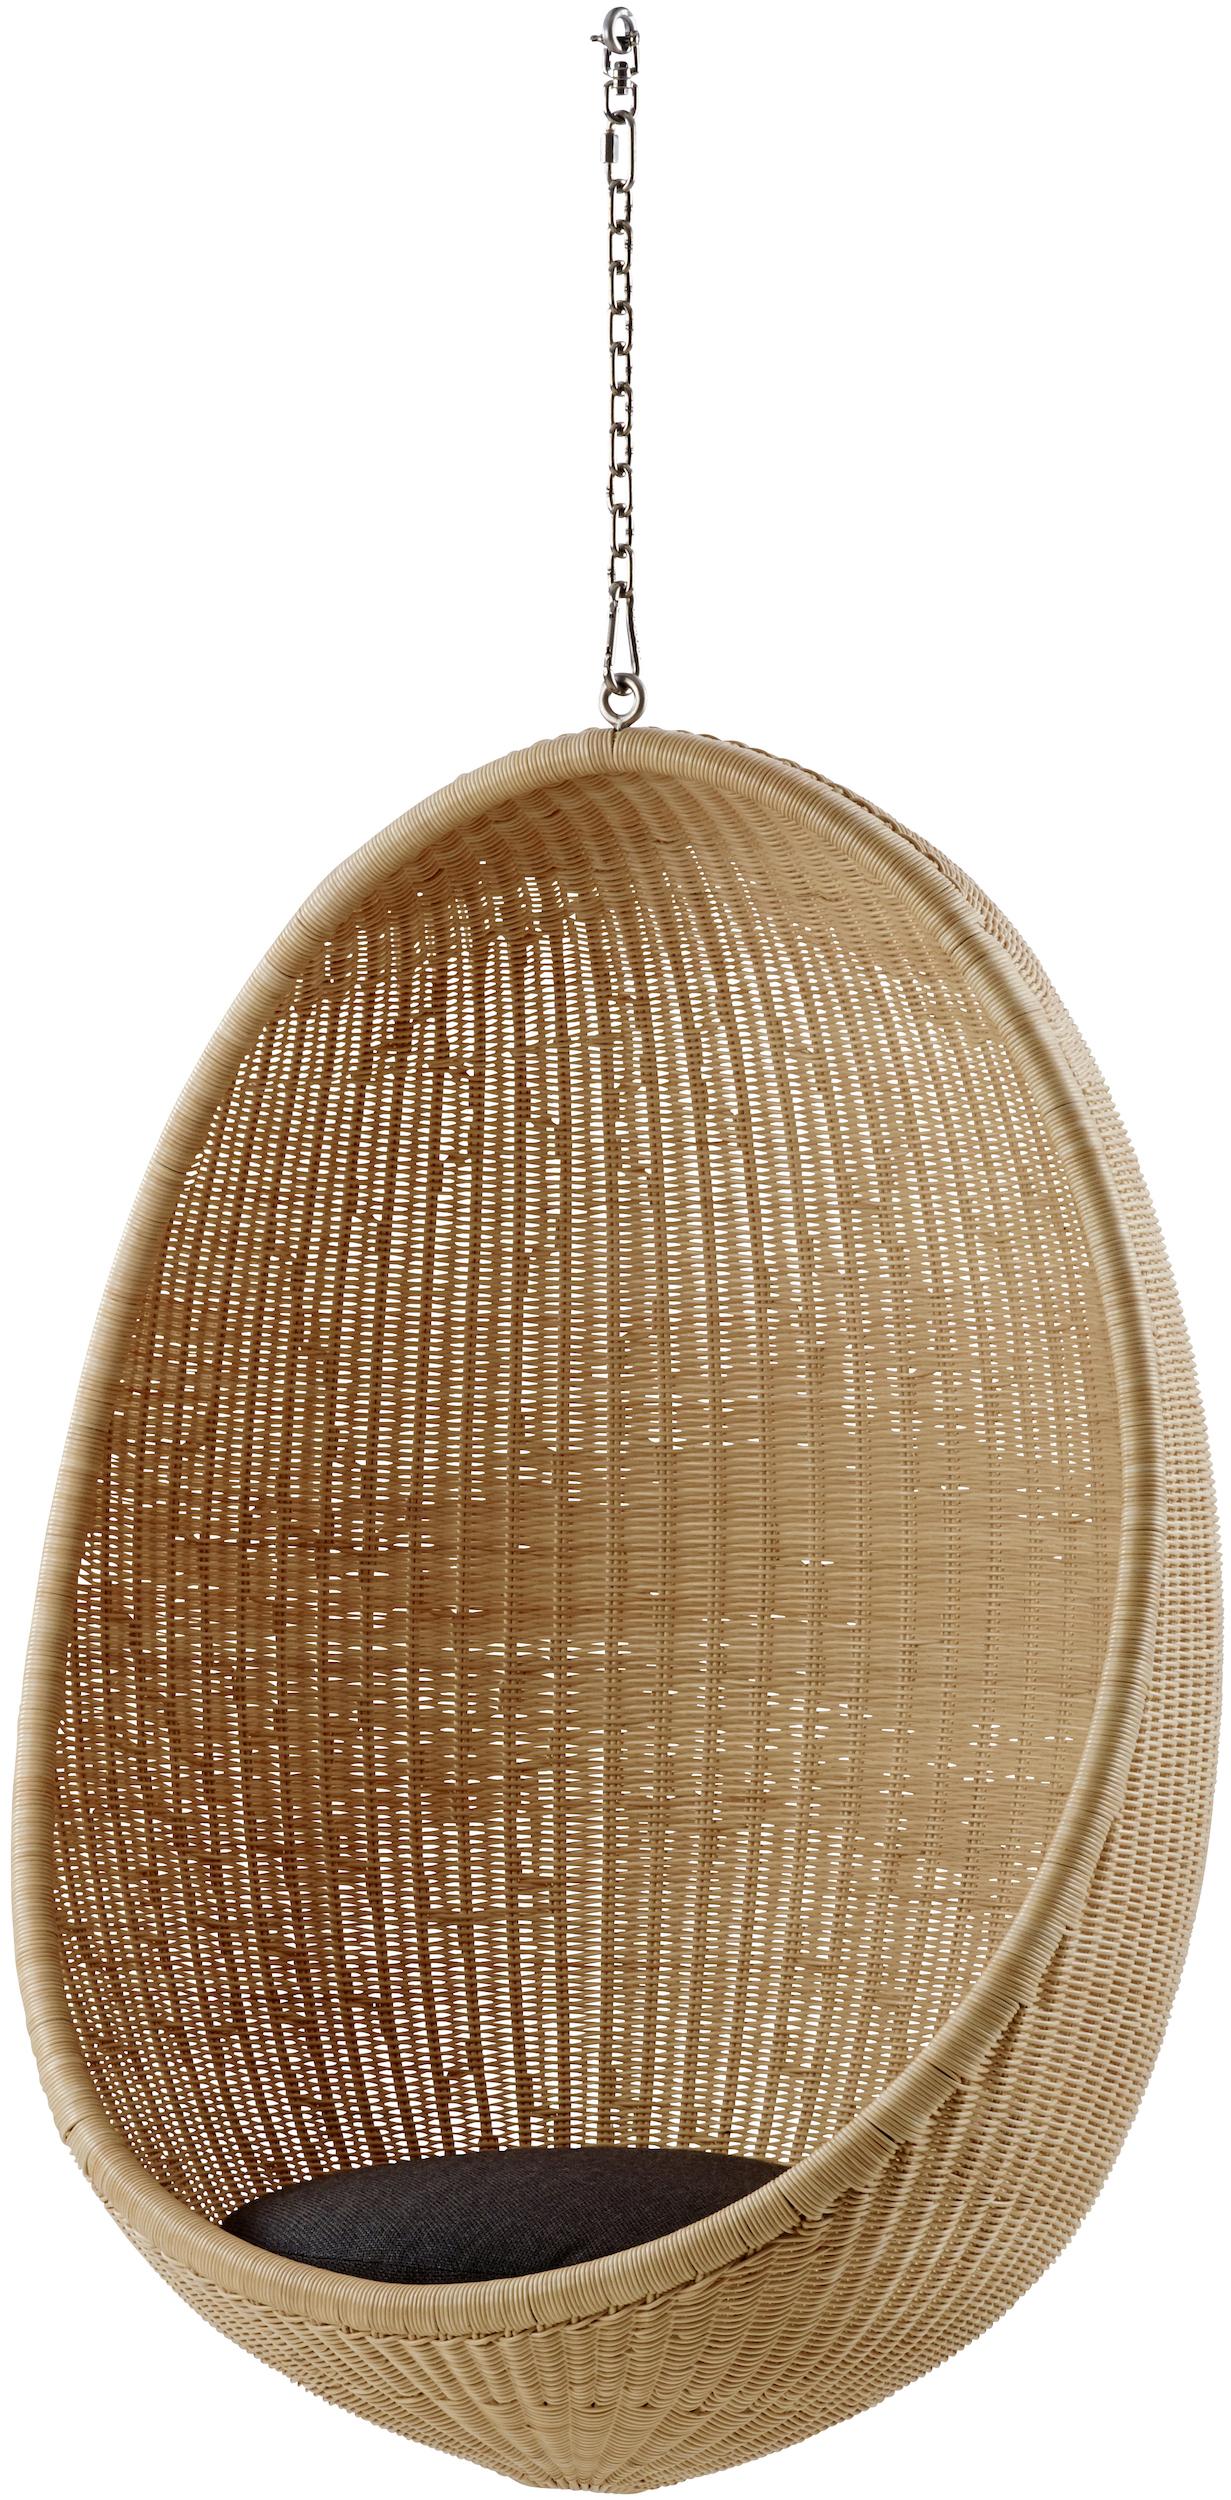 Egg Chair Hang.Sika Design Hanging Egg Chair Design Nanna Ditzel 1959